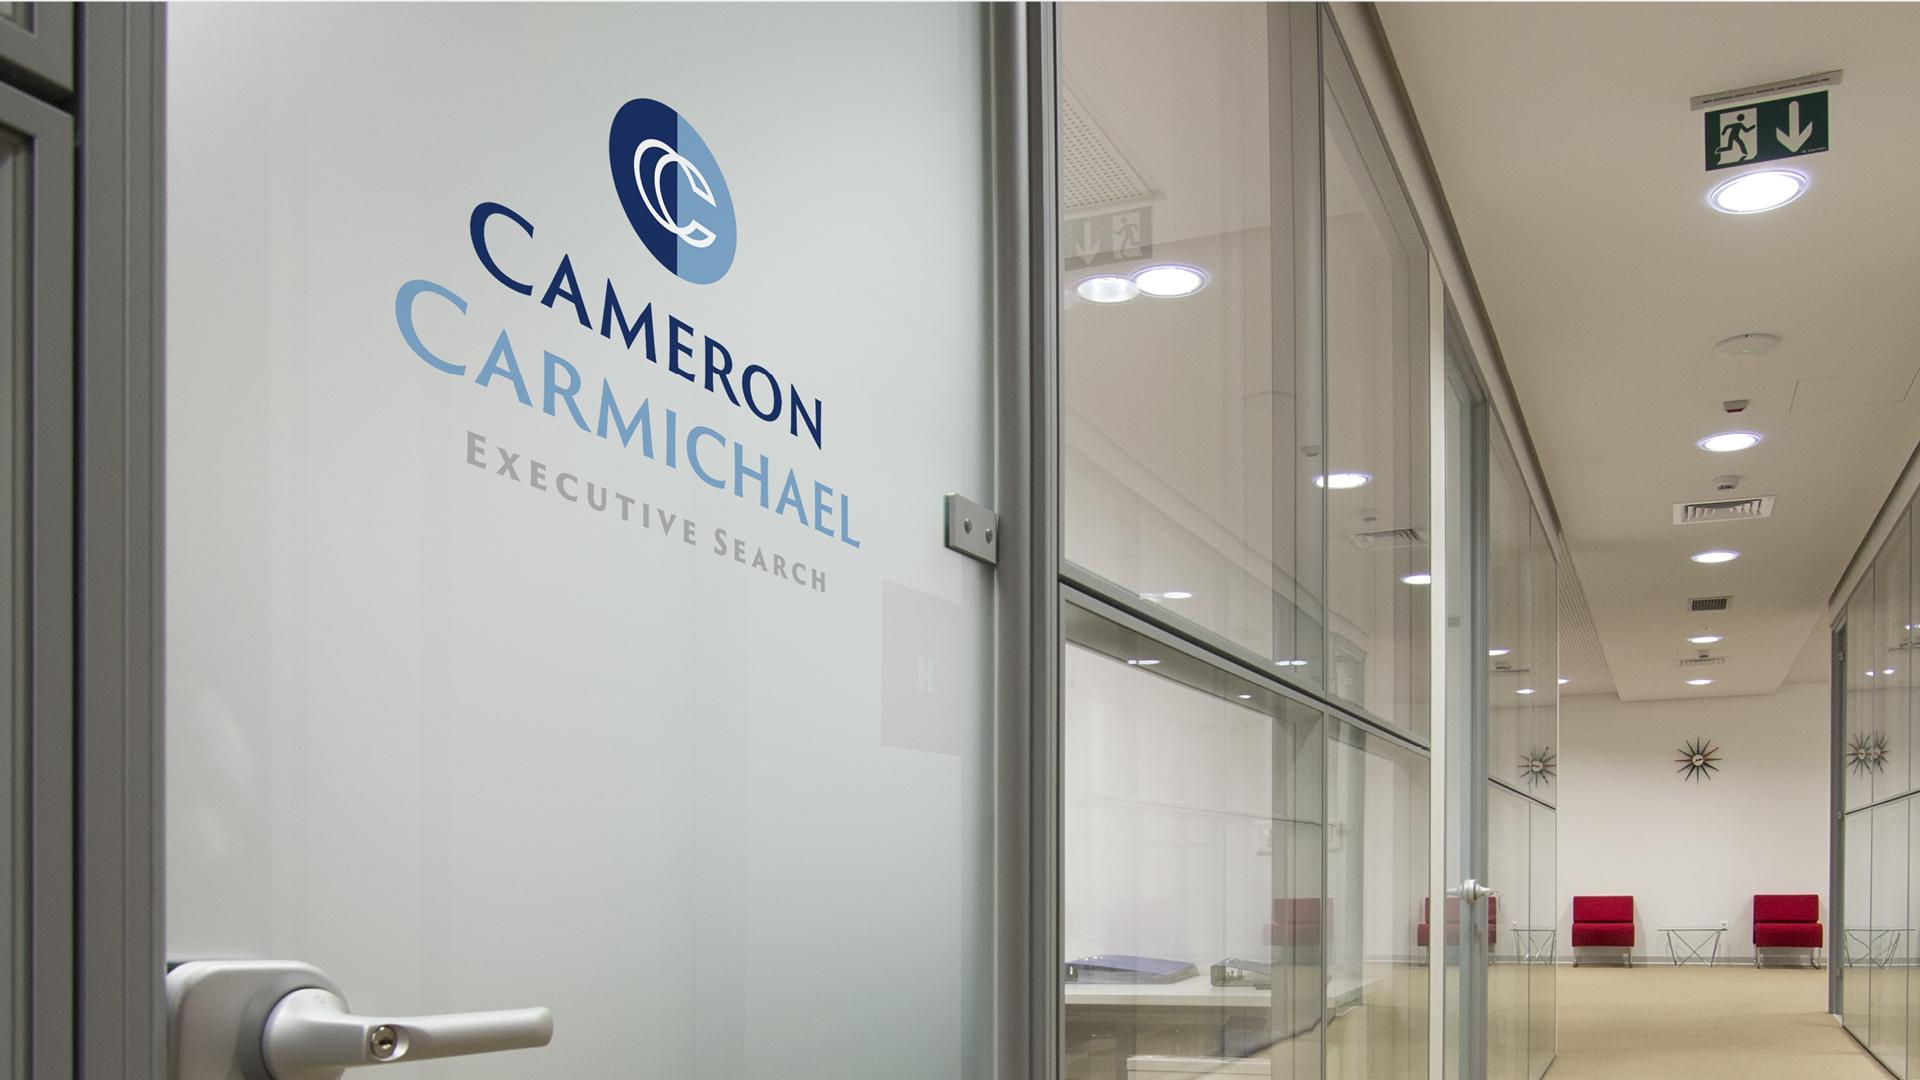 Cameron Carmichael6.jpg